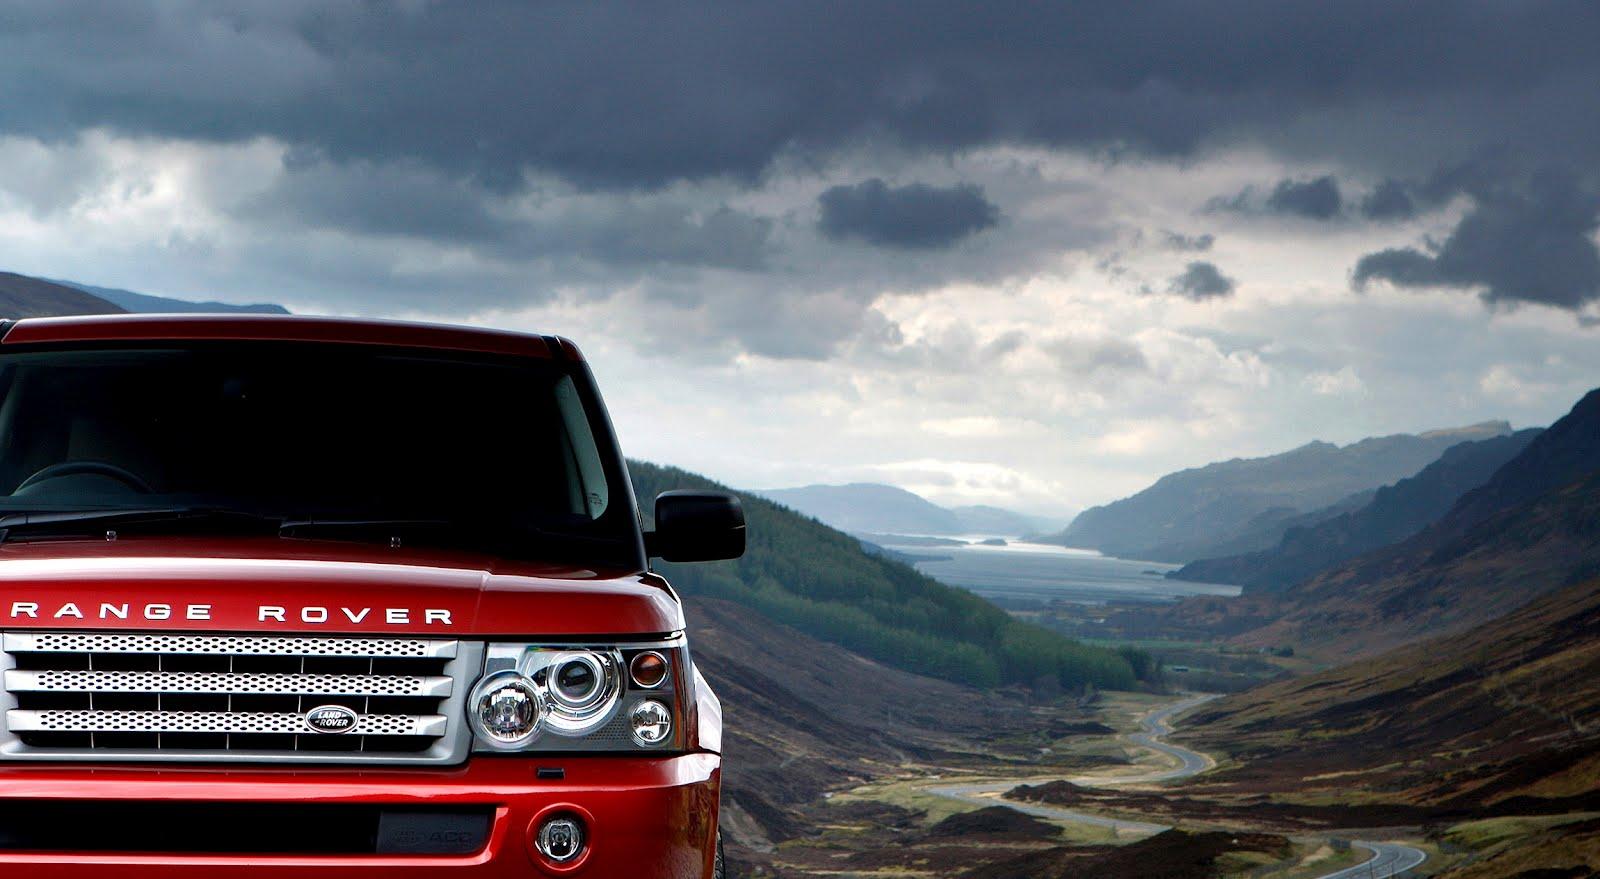 Discovery Sport Land Rover >> Imagini cu masini rosii | StolenIMG